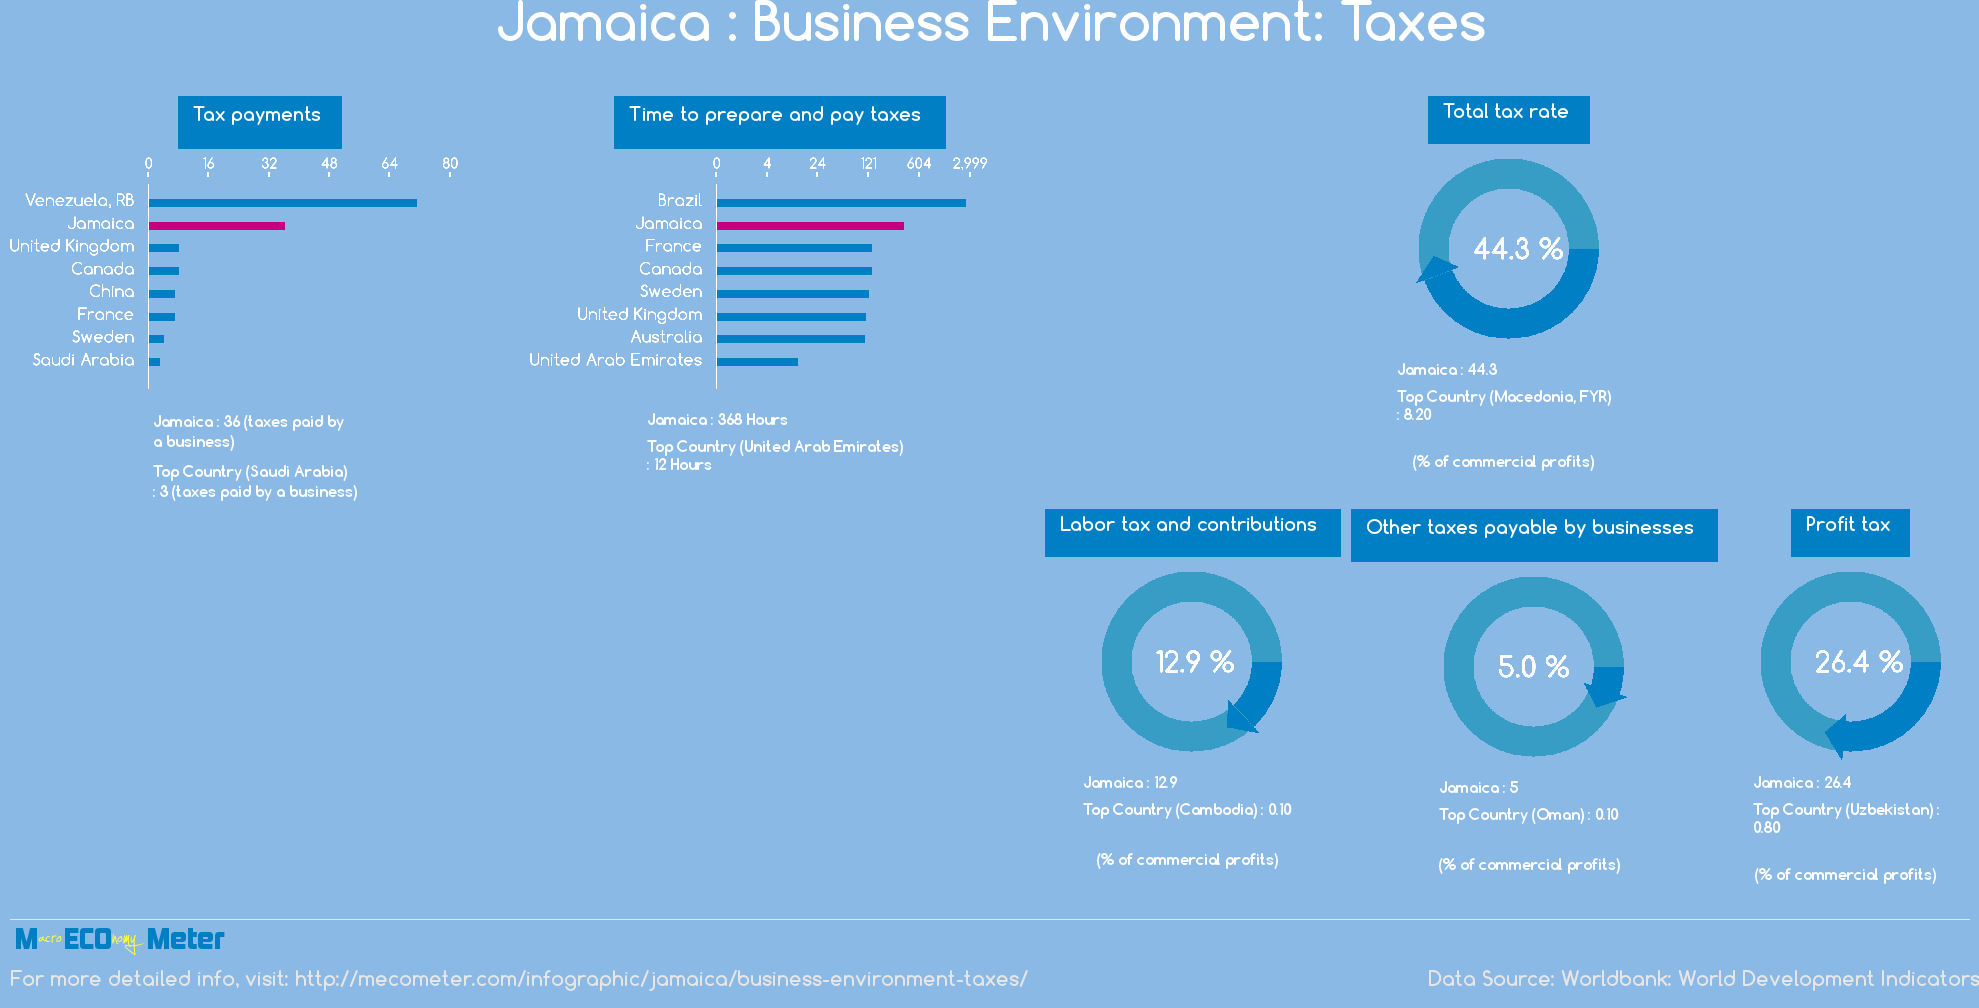 Jamaica : Business Environment: Taxes